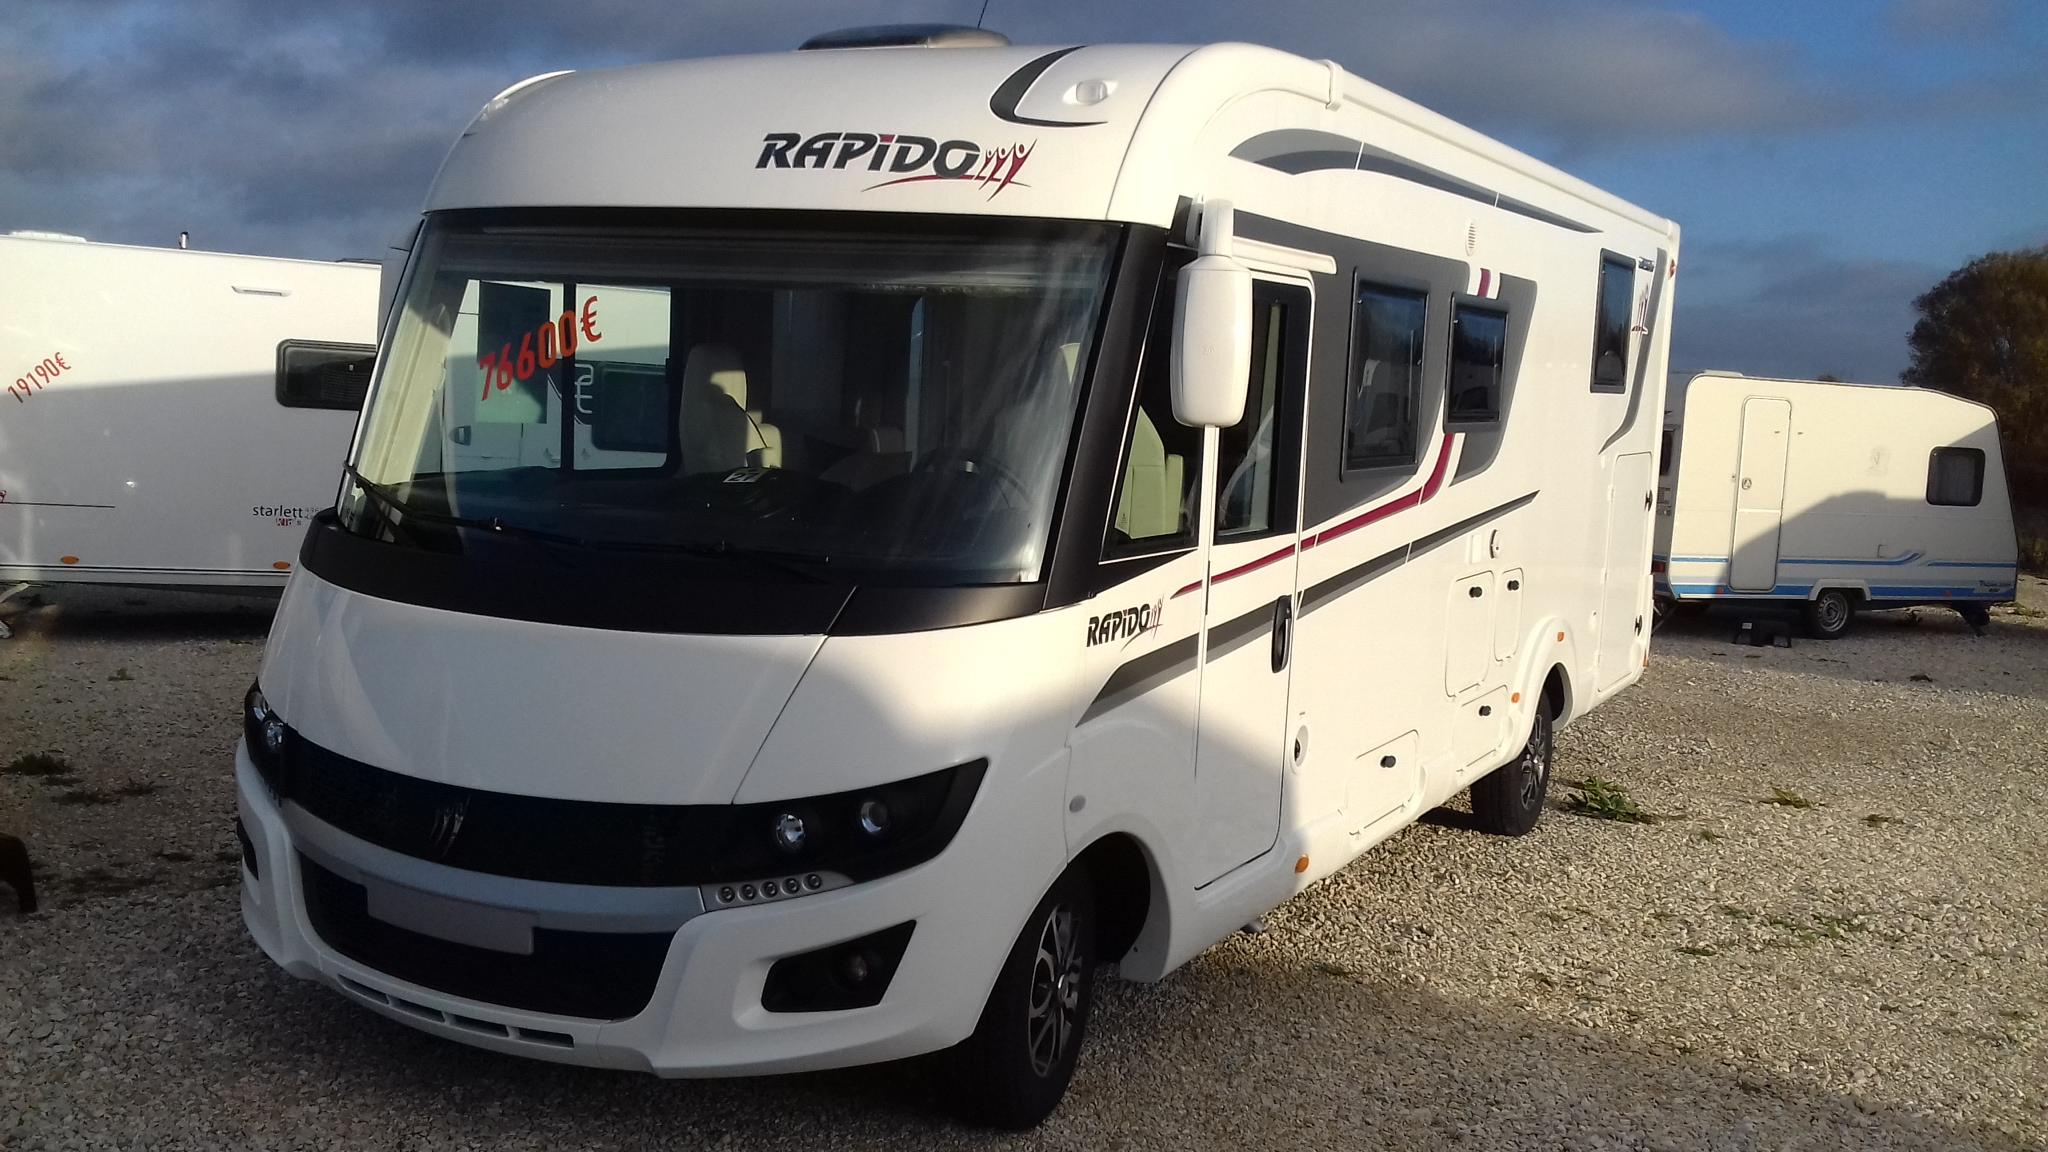 rapido 8096df premium edit neuf de 2018 fiat camping car en vente appoigny yonne 89. Black Bedroom Furniture Sets. Home Design Ideas